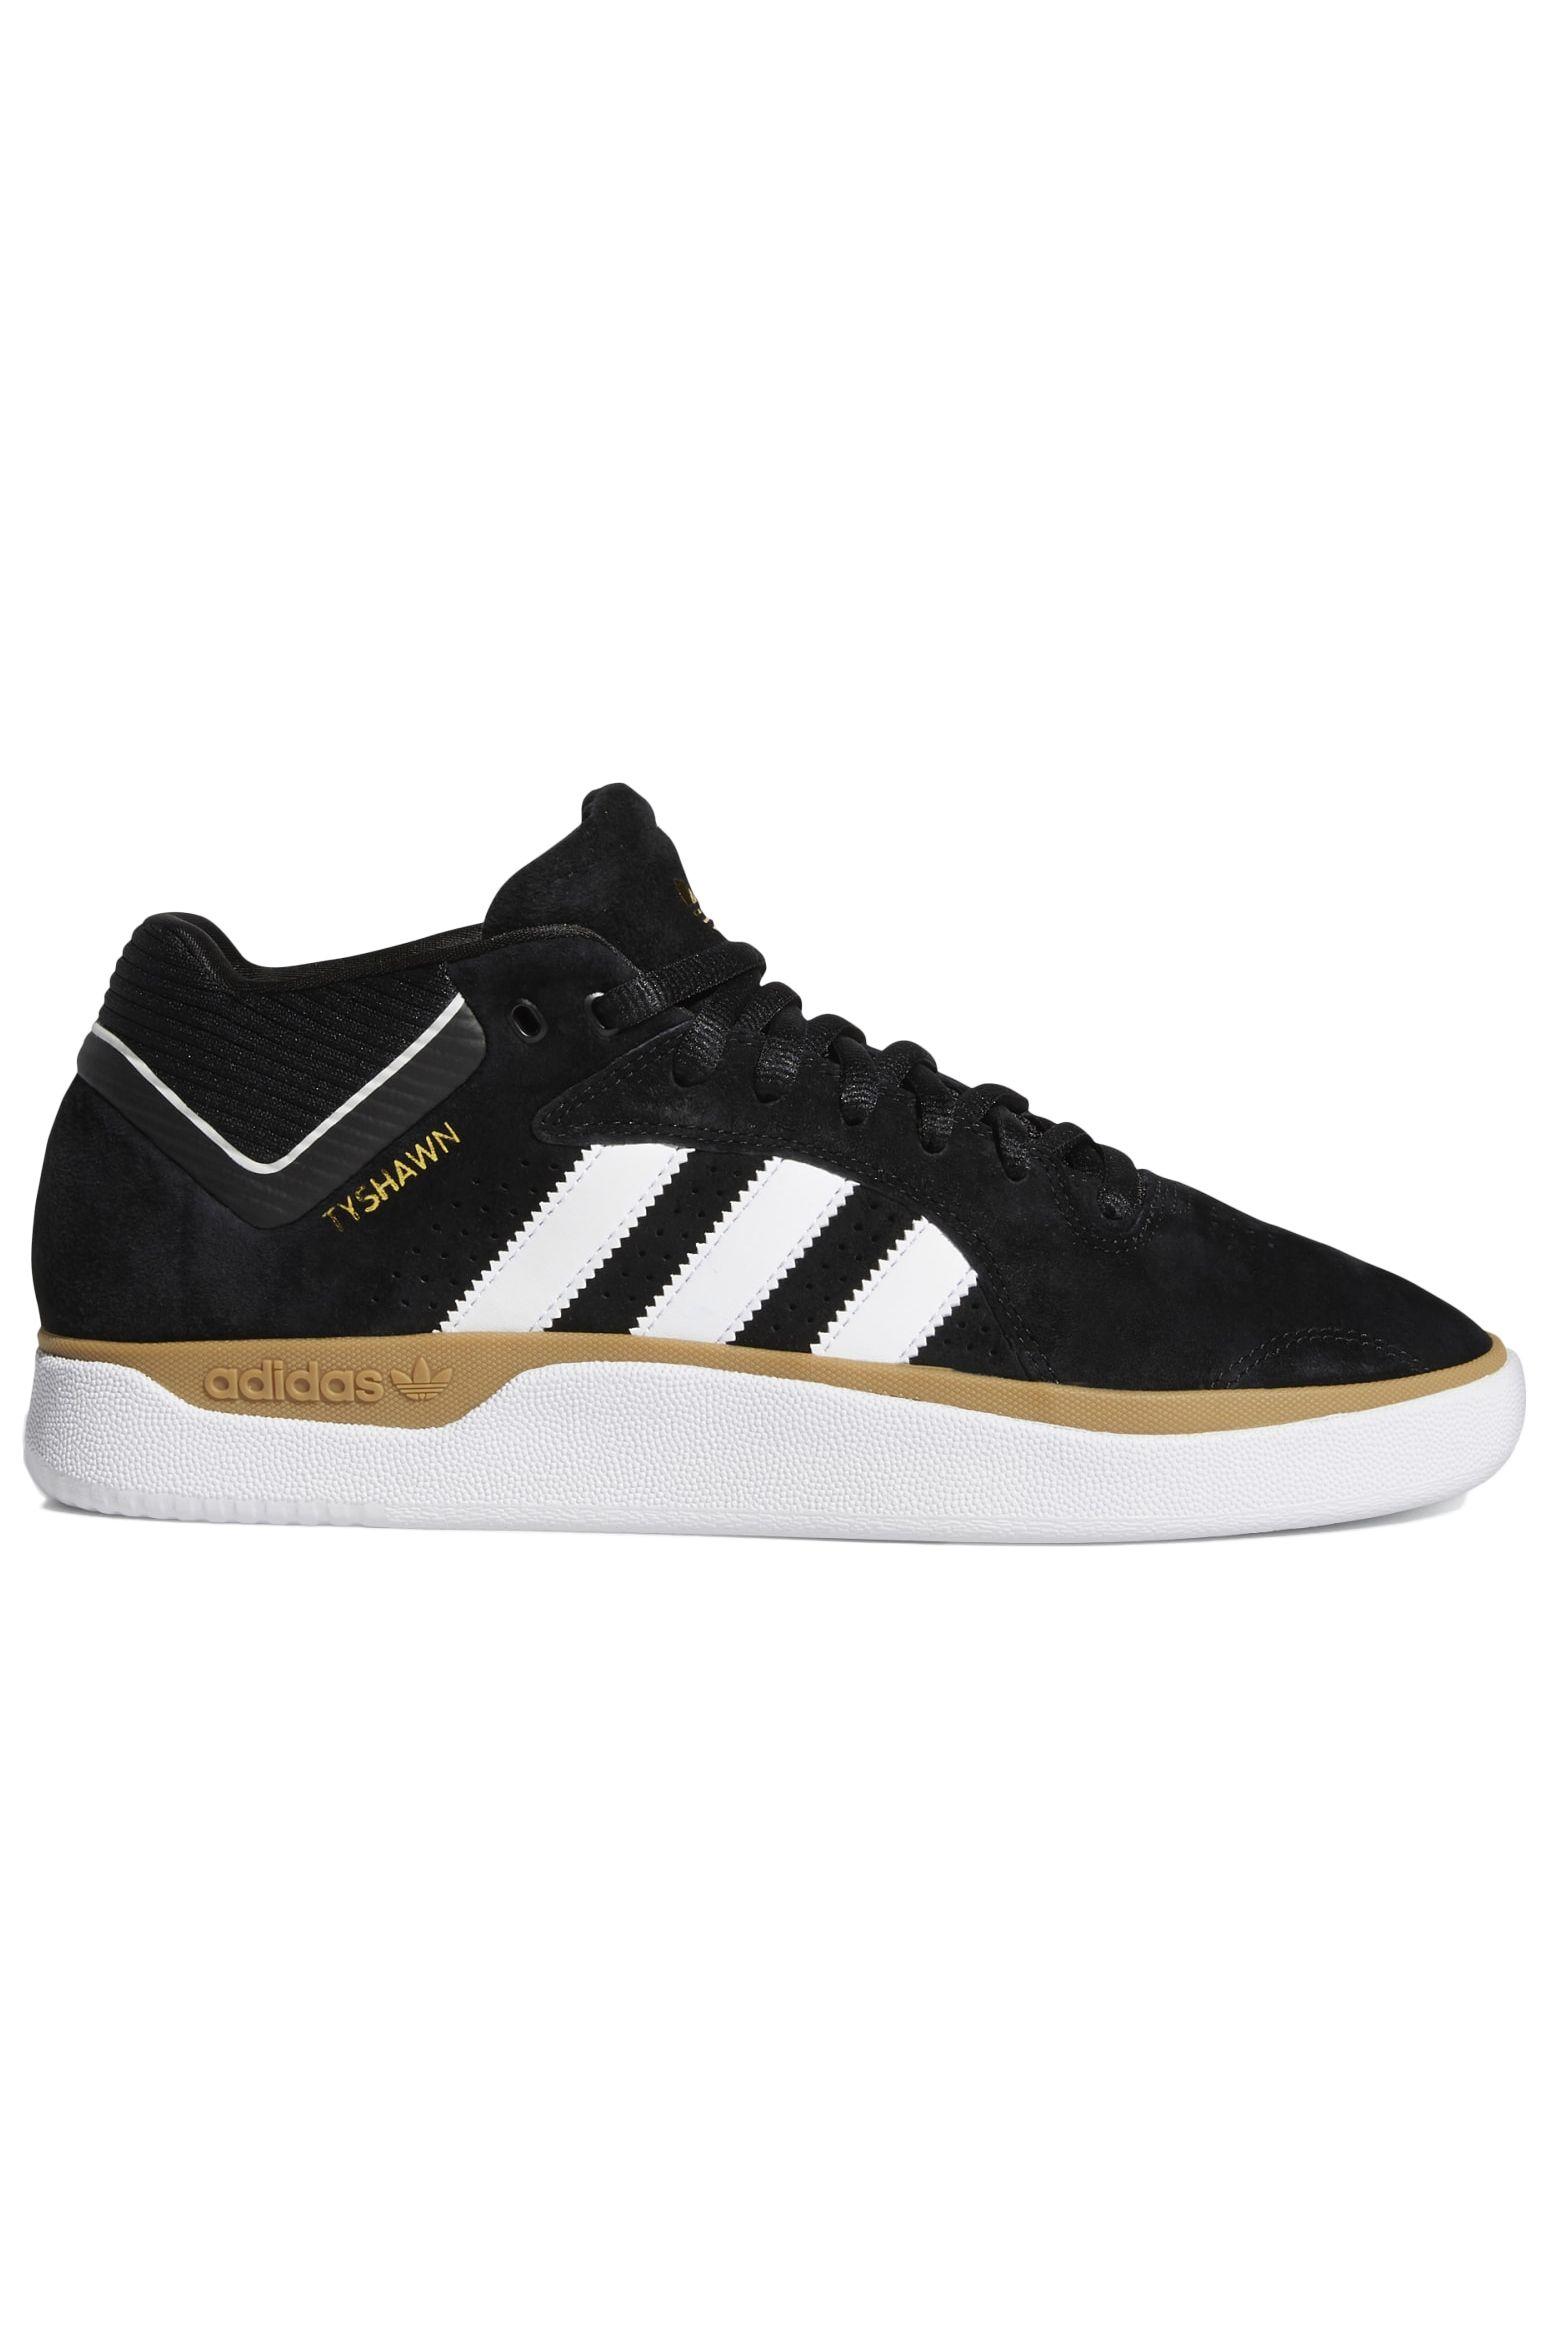 Adidas Shoes TYSHAWN Core Black/Ftwr White/Gum4